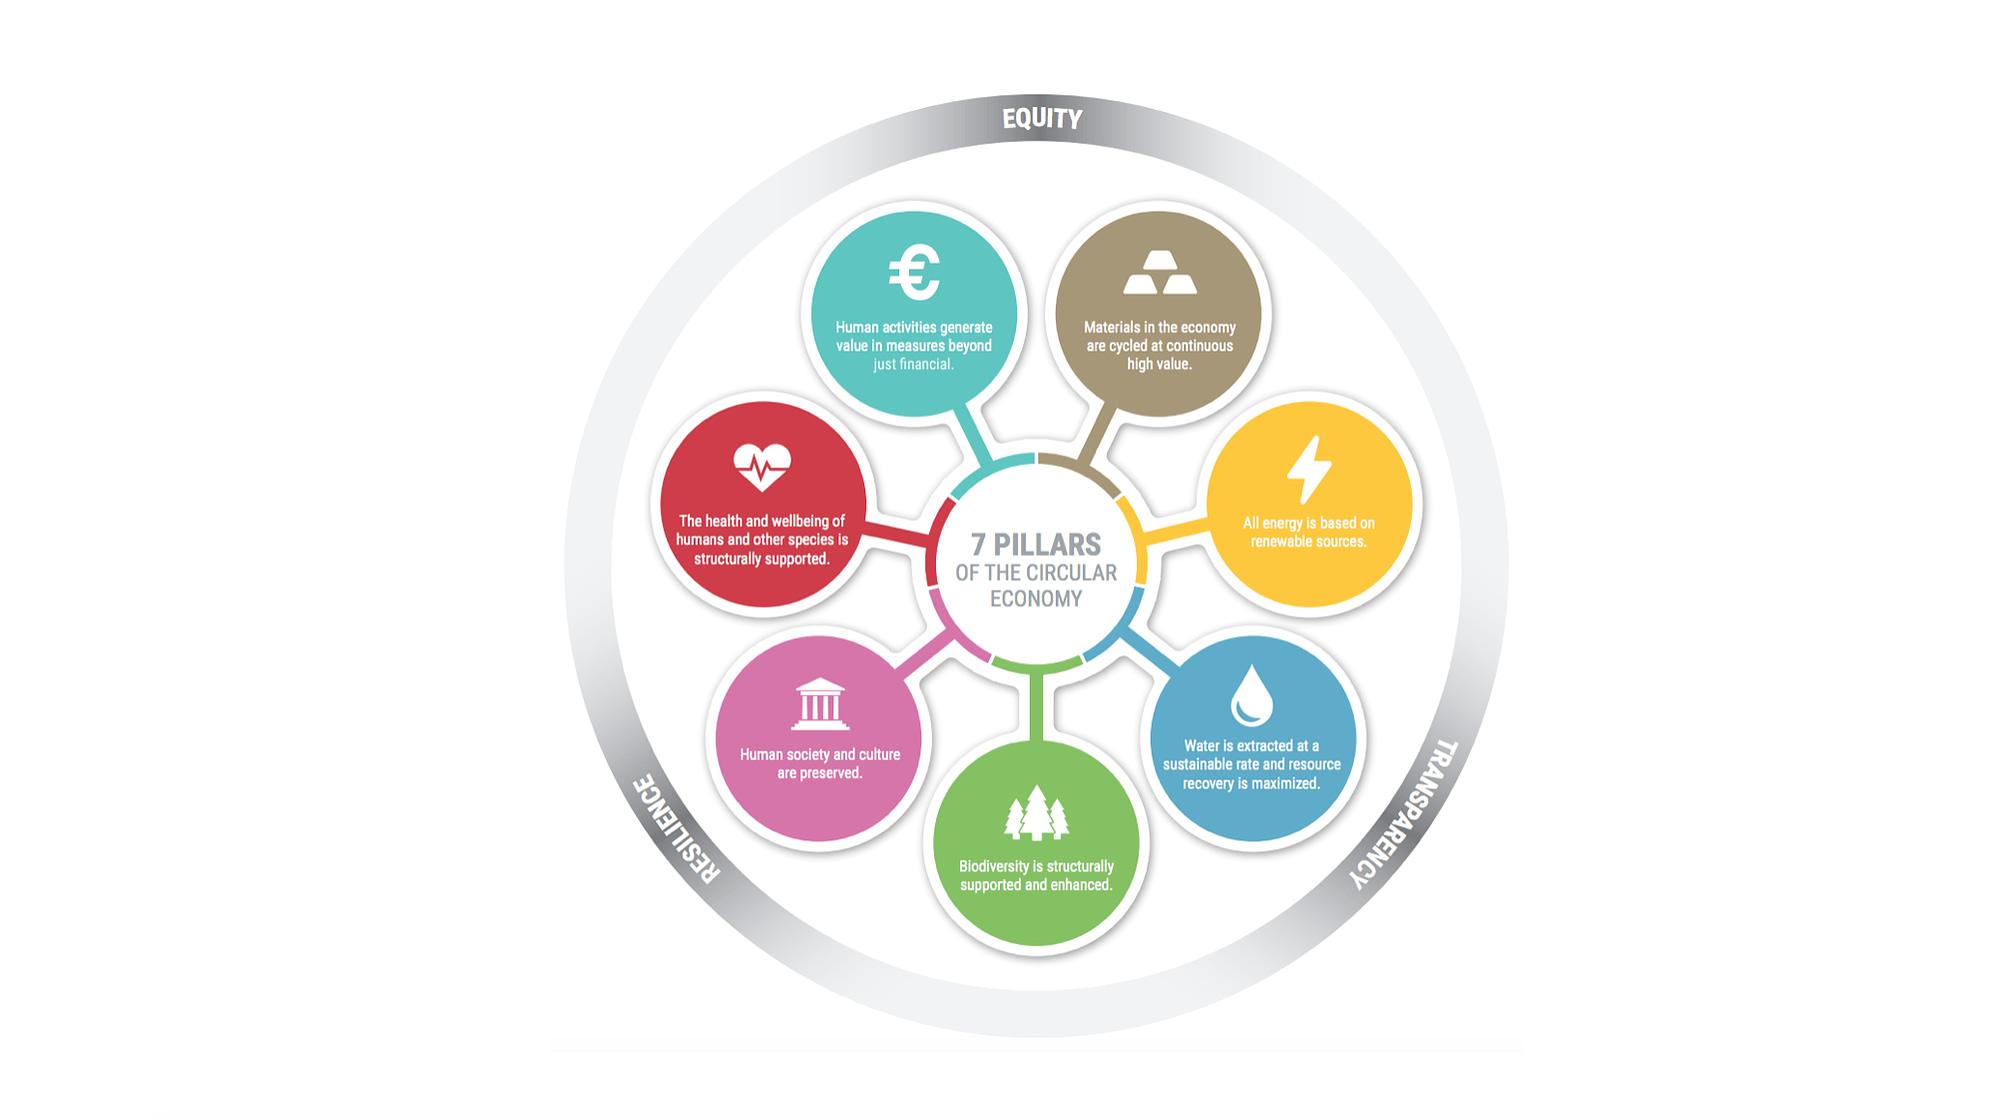 Seven pillars of the circular economy